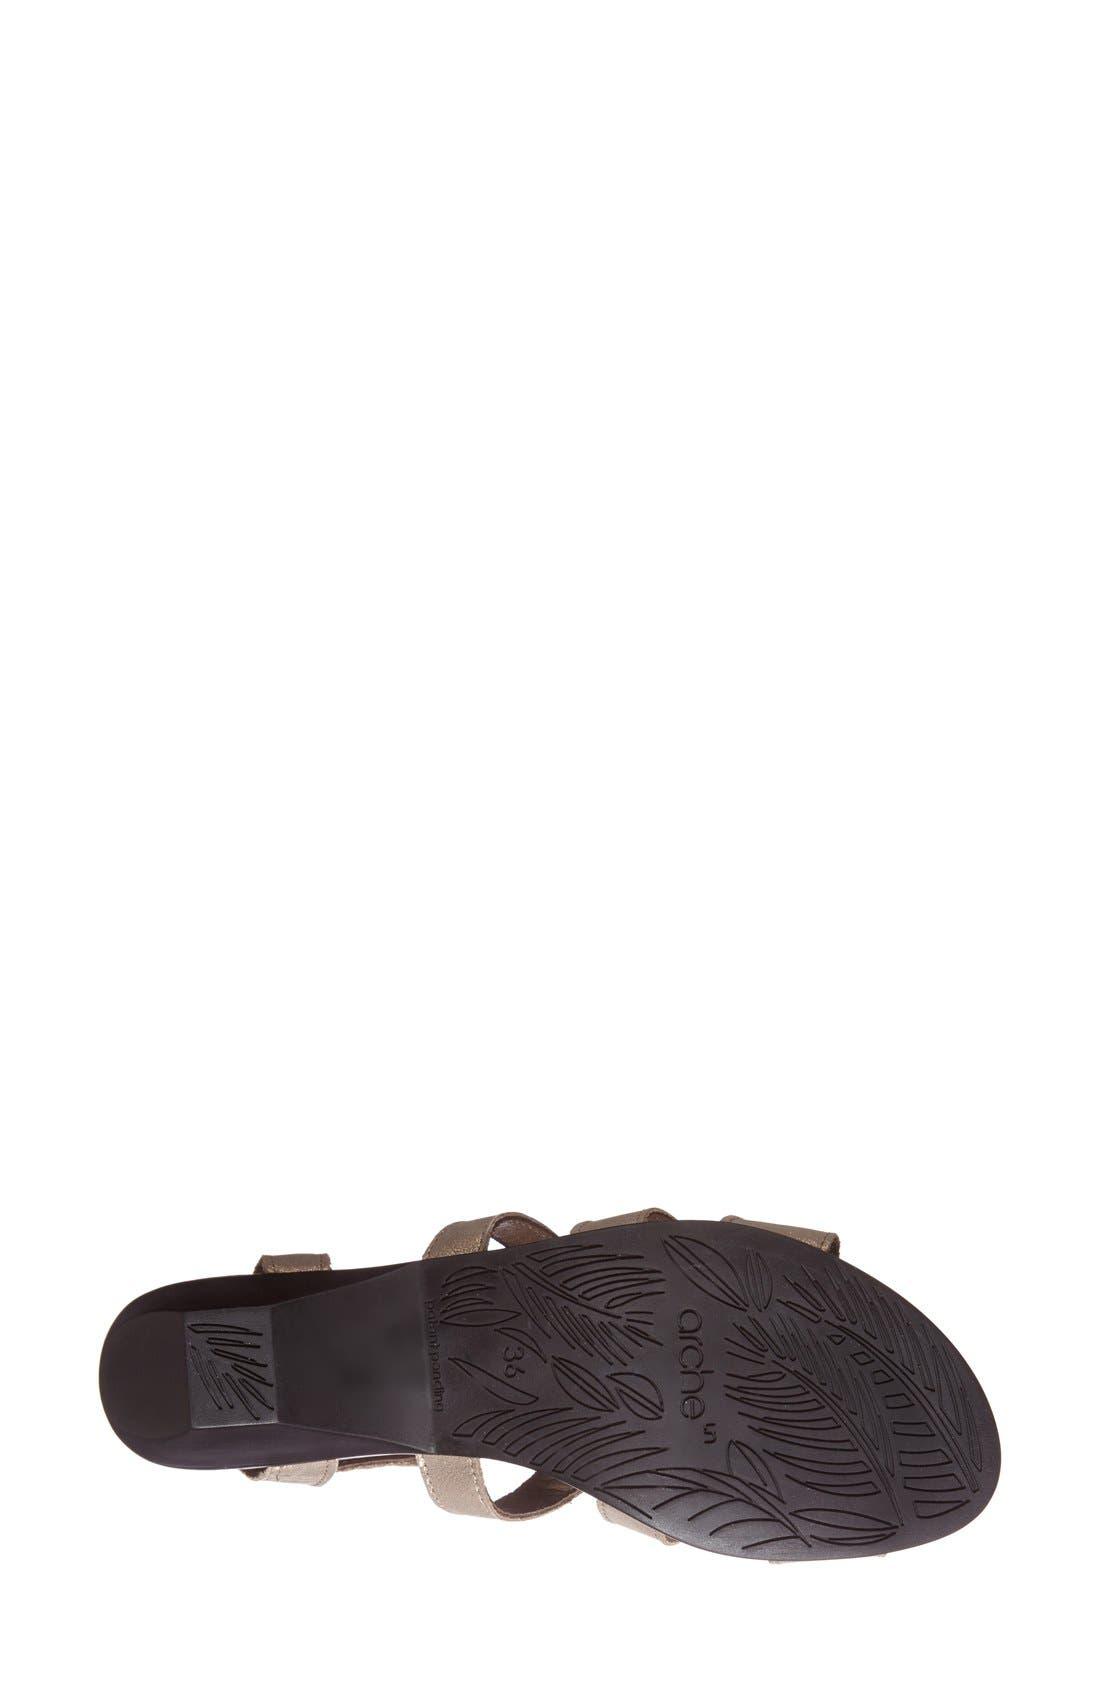 'Obela' Water Resistant Leather Sandal,                             Alternate thumbnail 21, color,